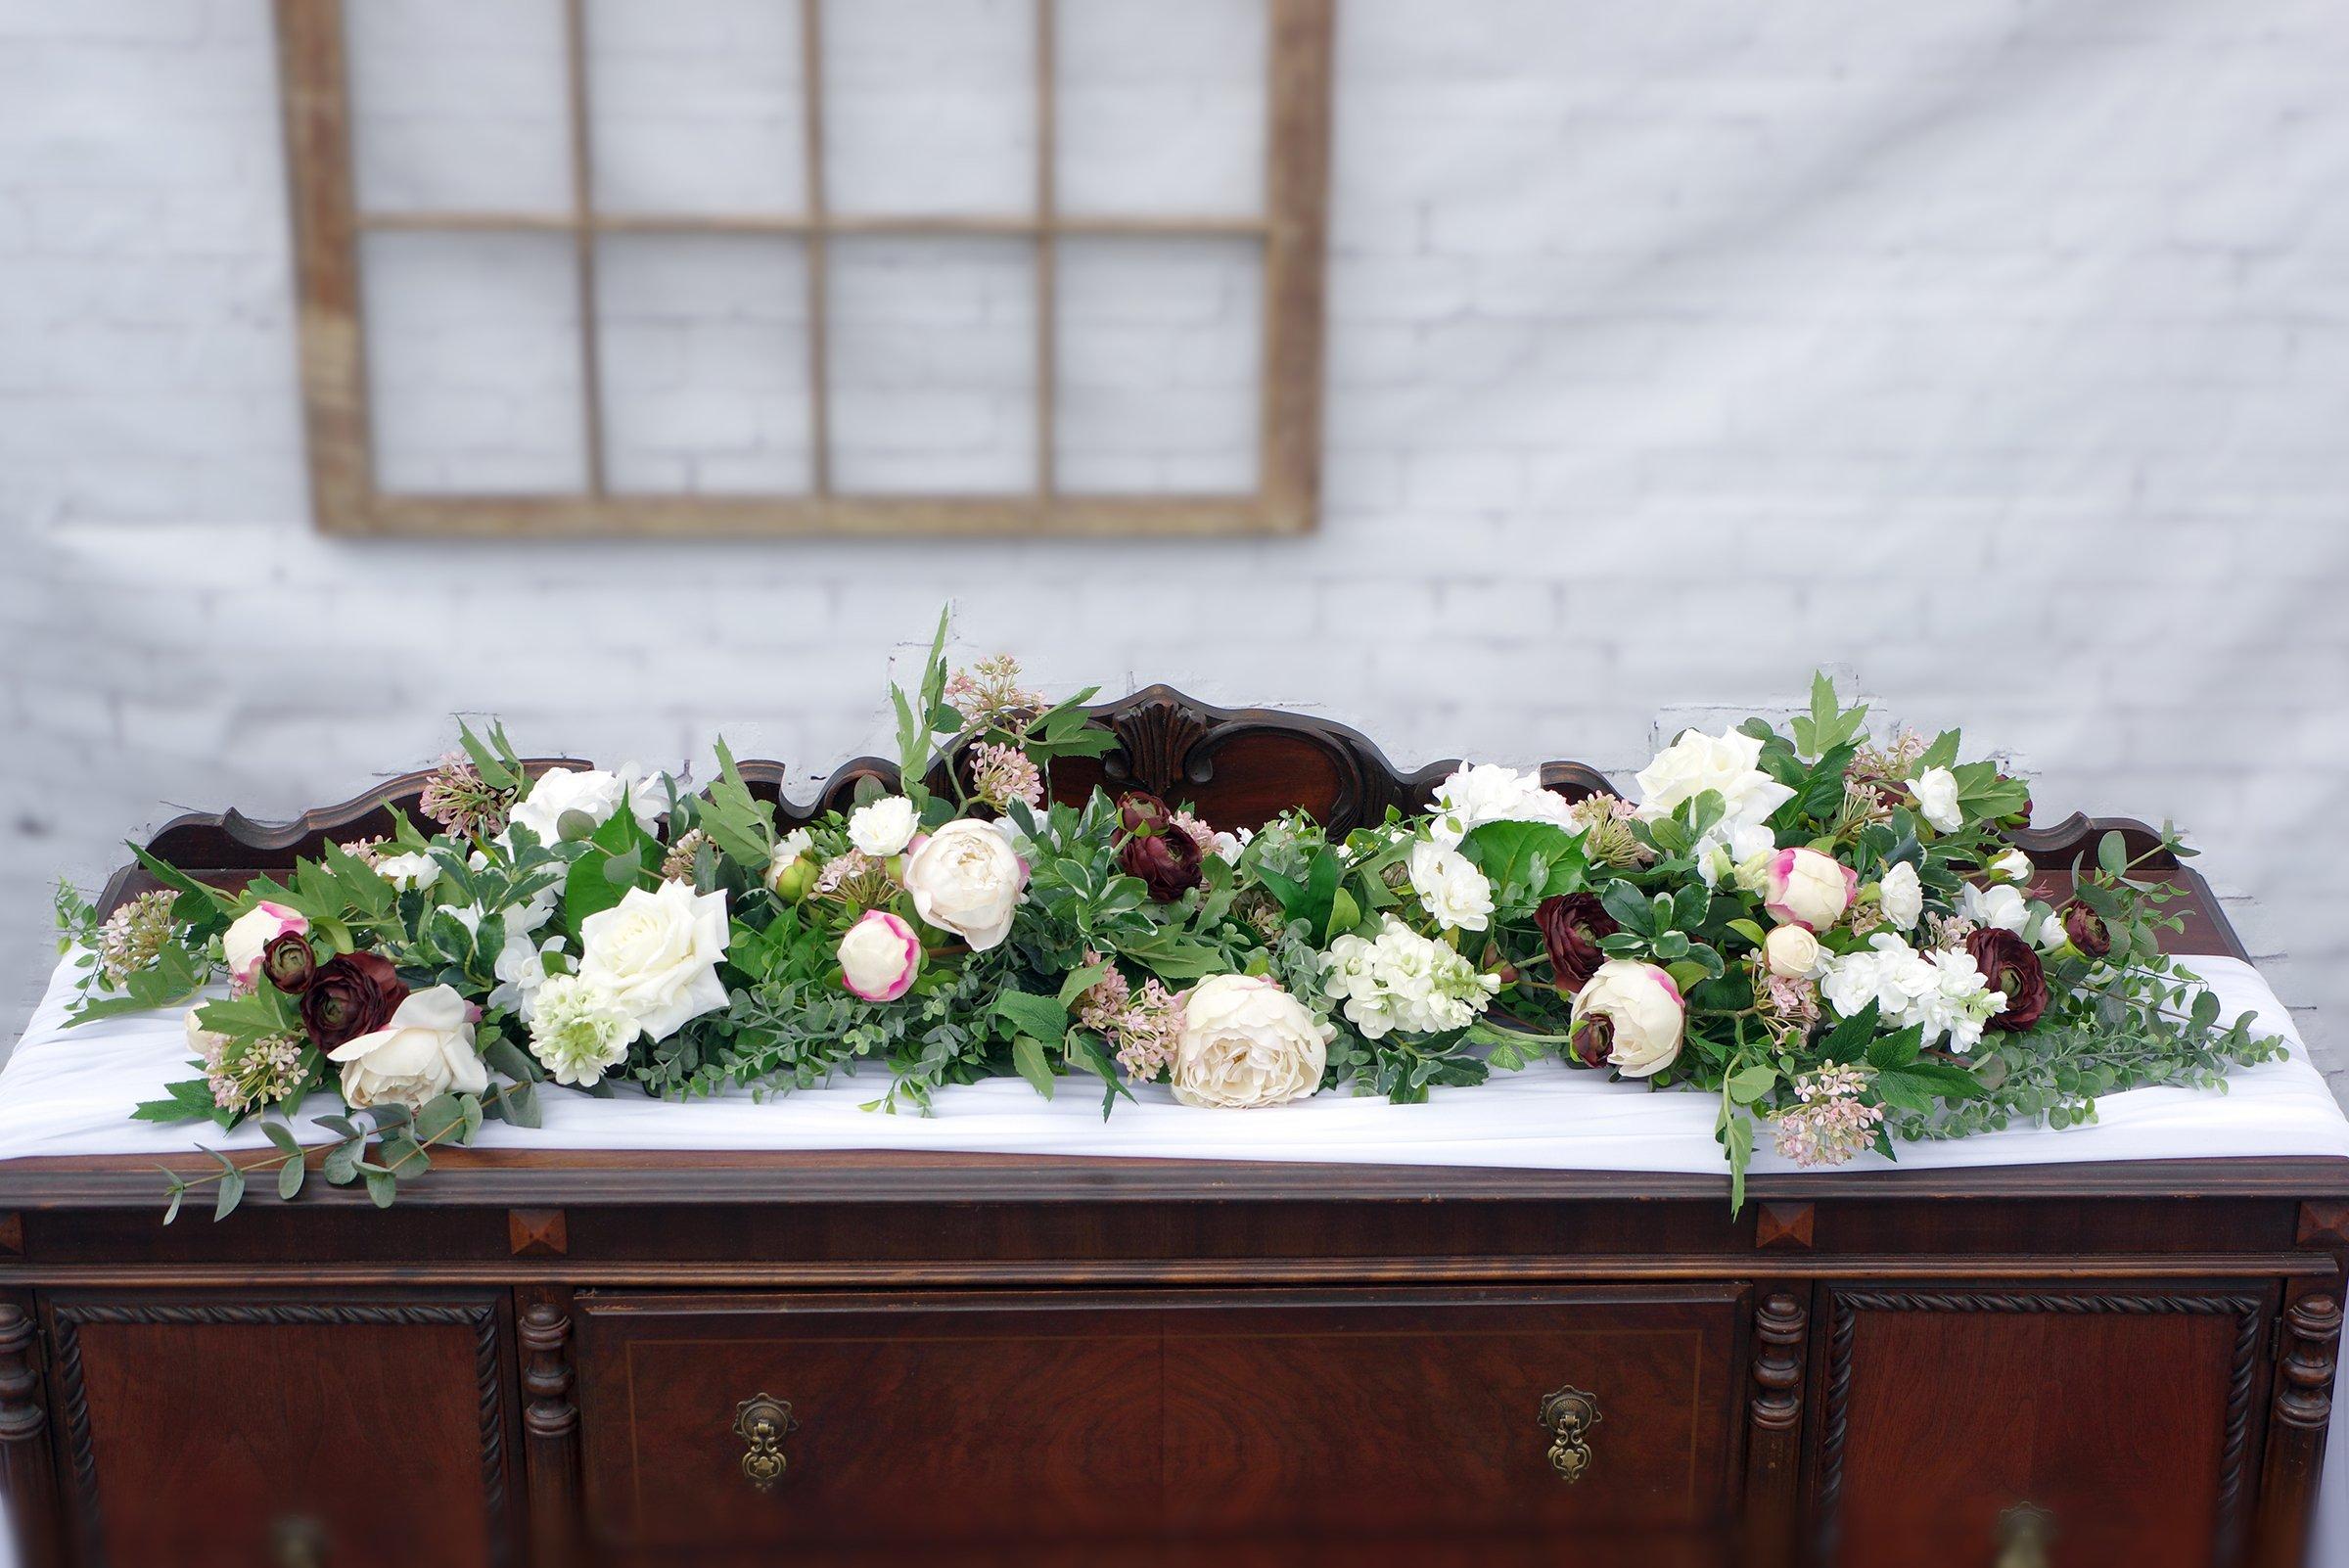 Kingston Florist: 8' garland white